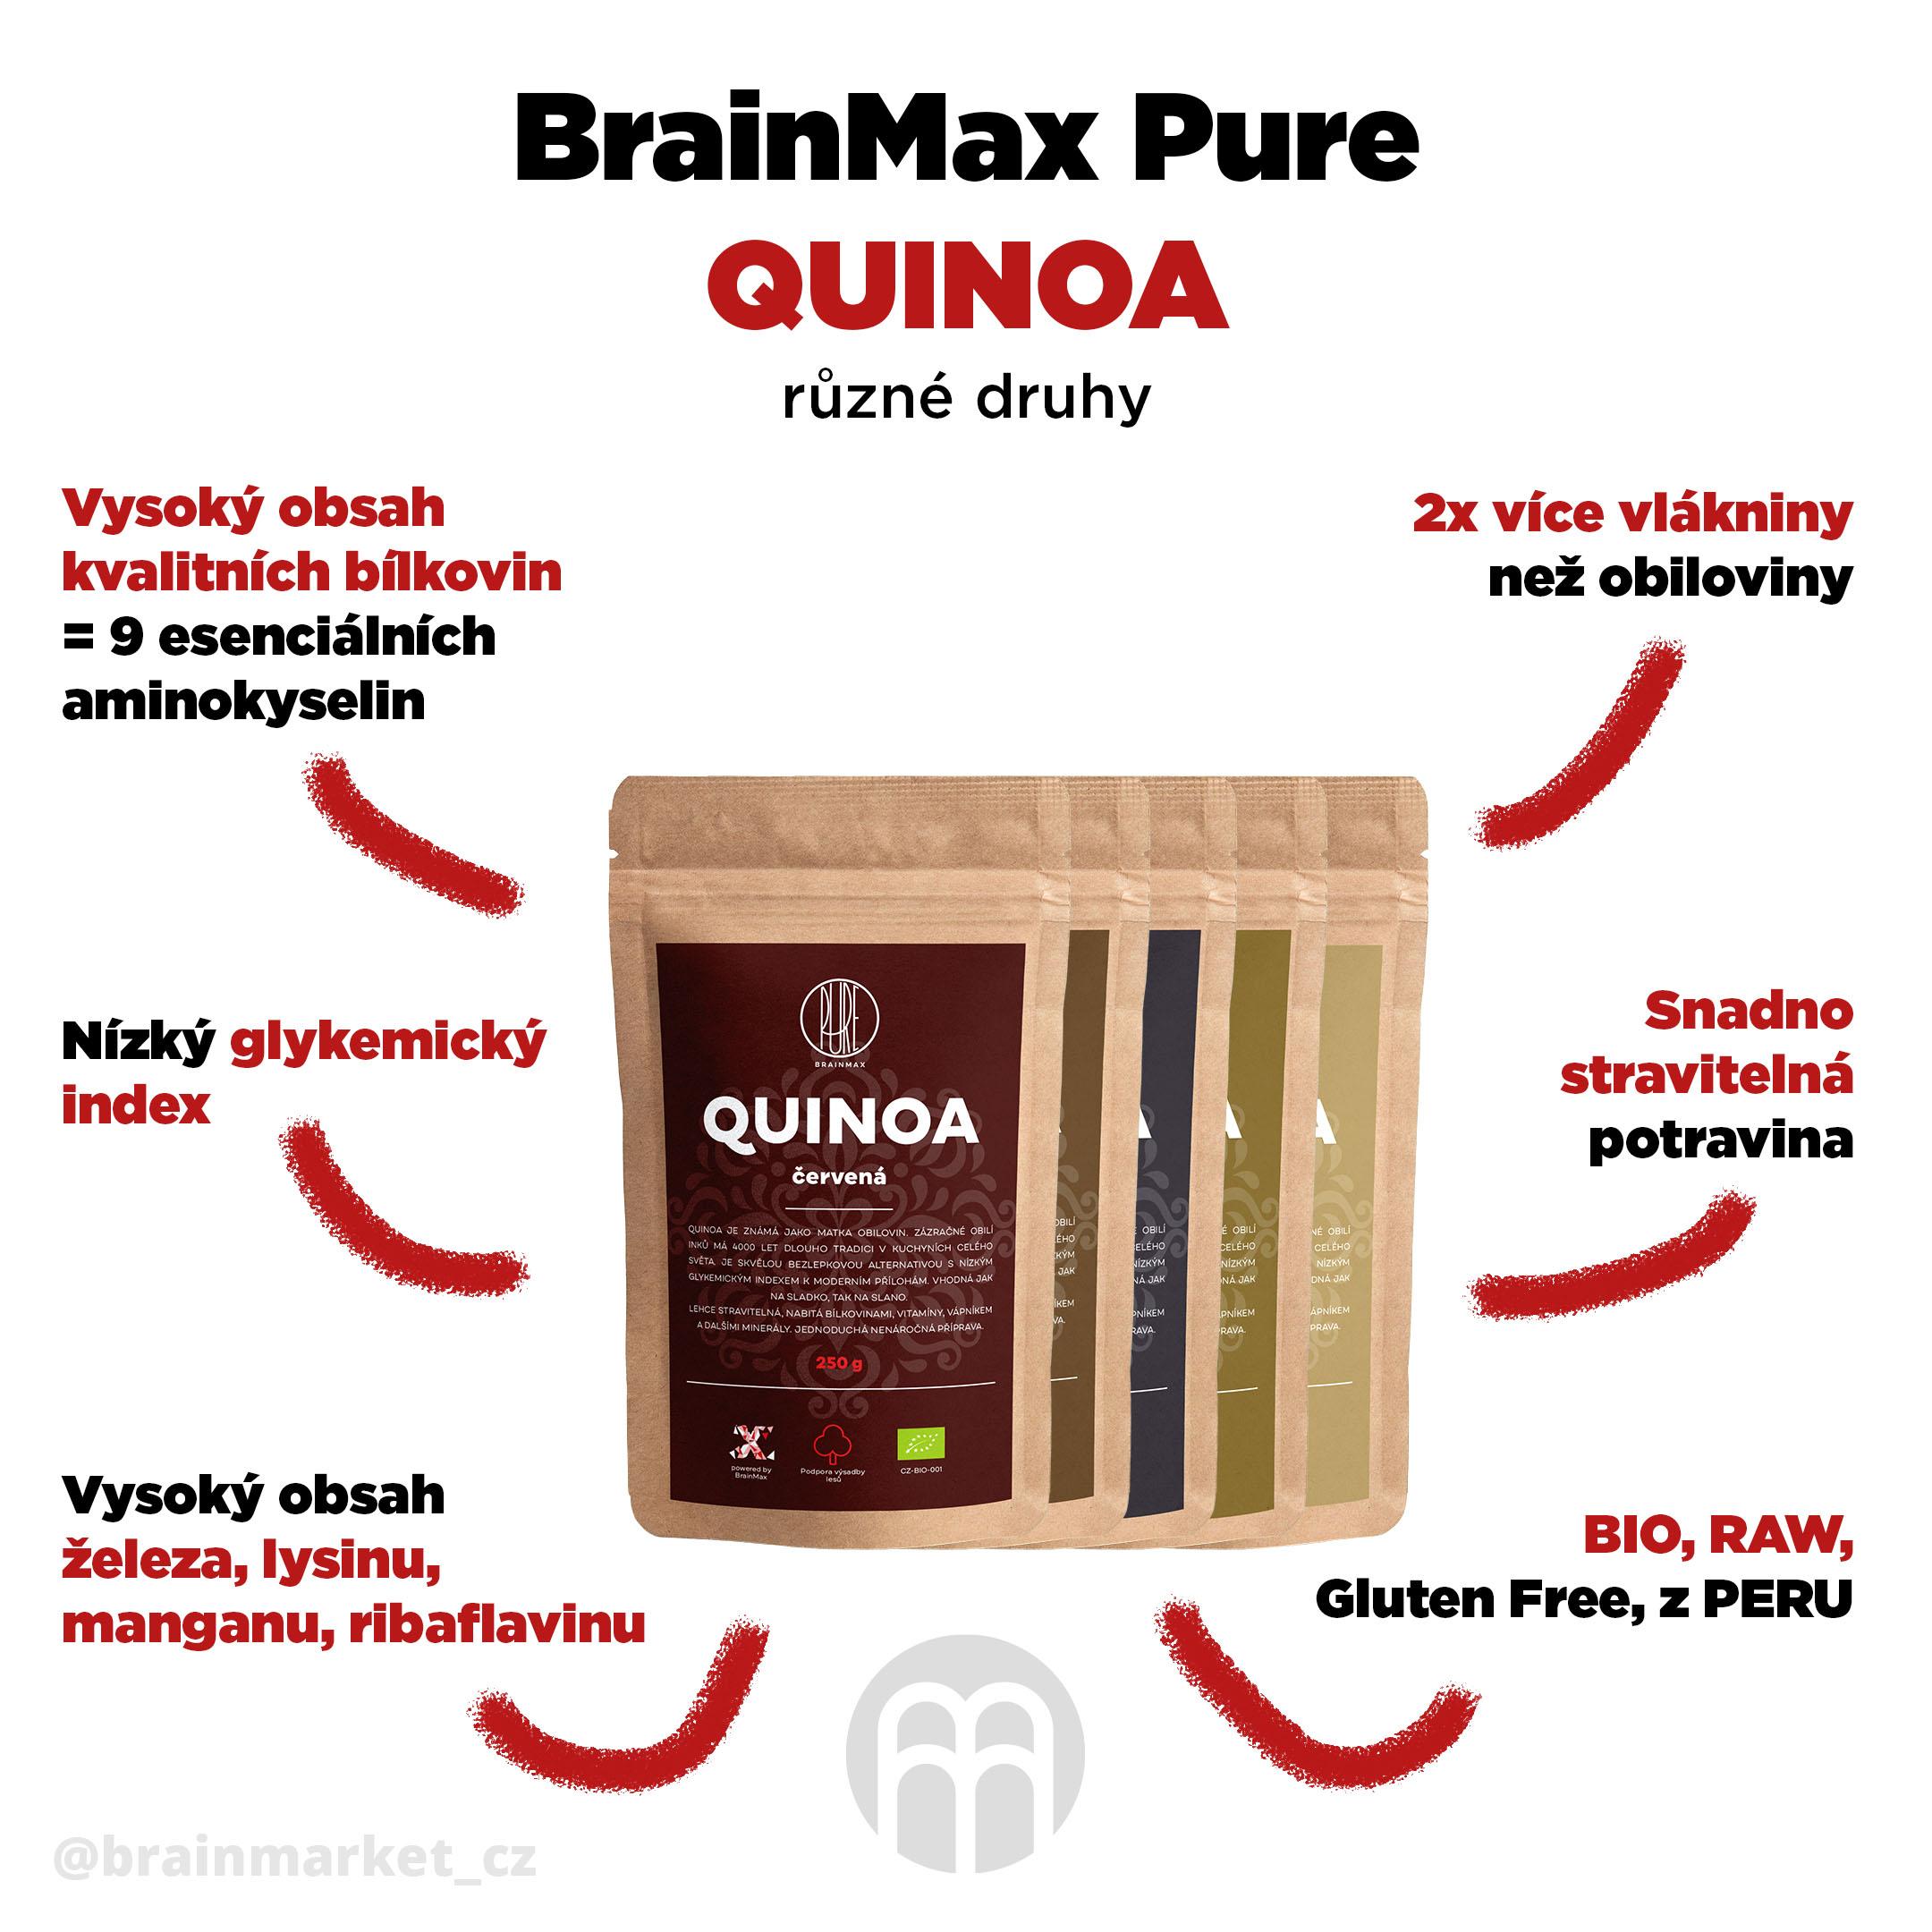 quinoa-infografika-brainmarket-cz